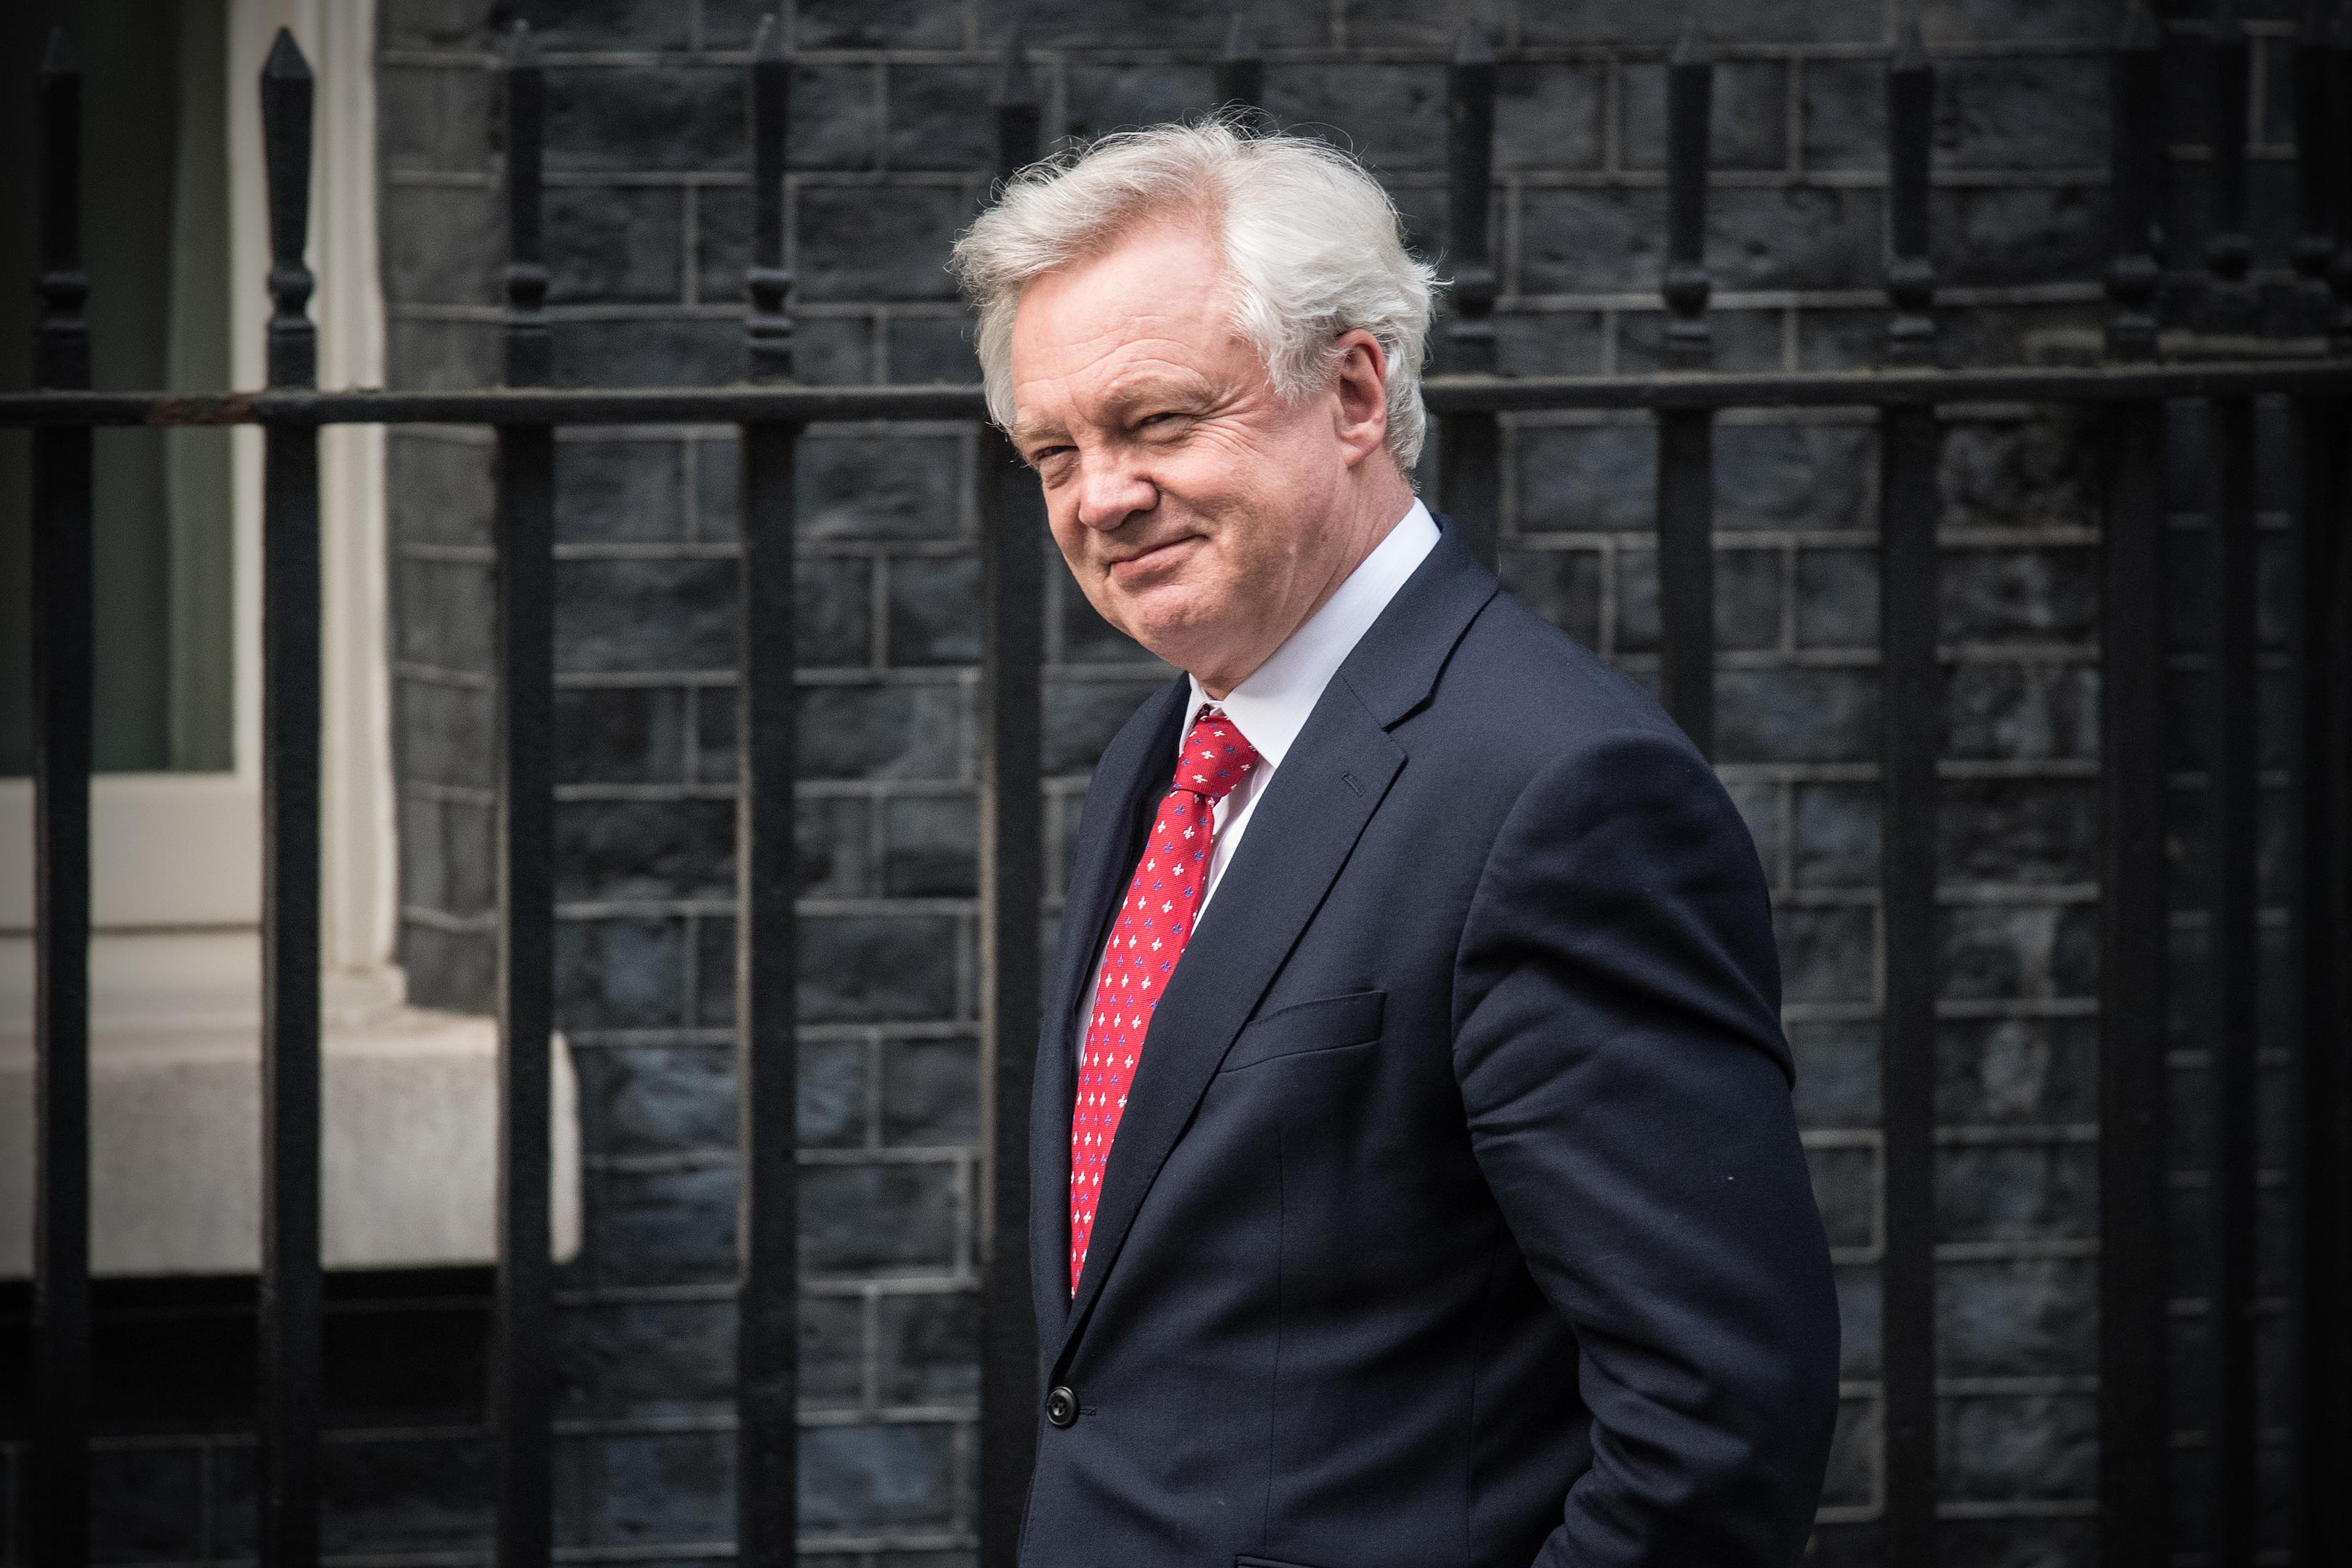 Brexit Secretary David Davis (Photo by Carl Court/Getty Images)